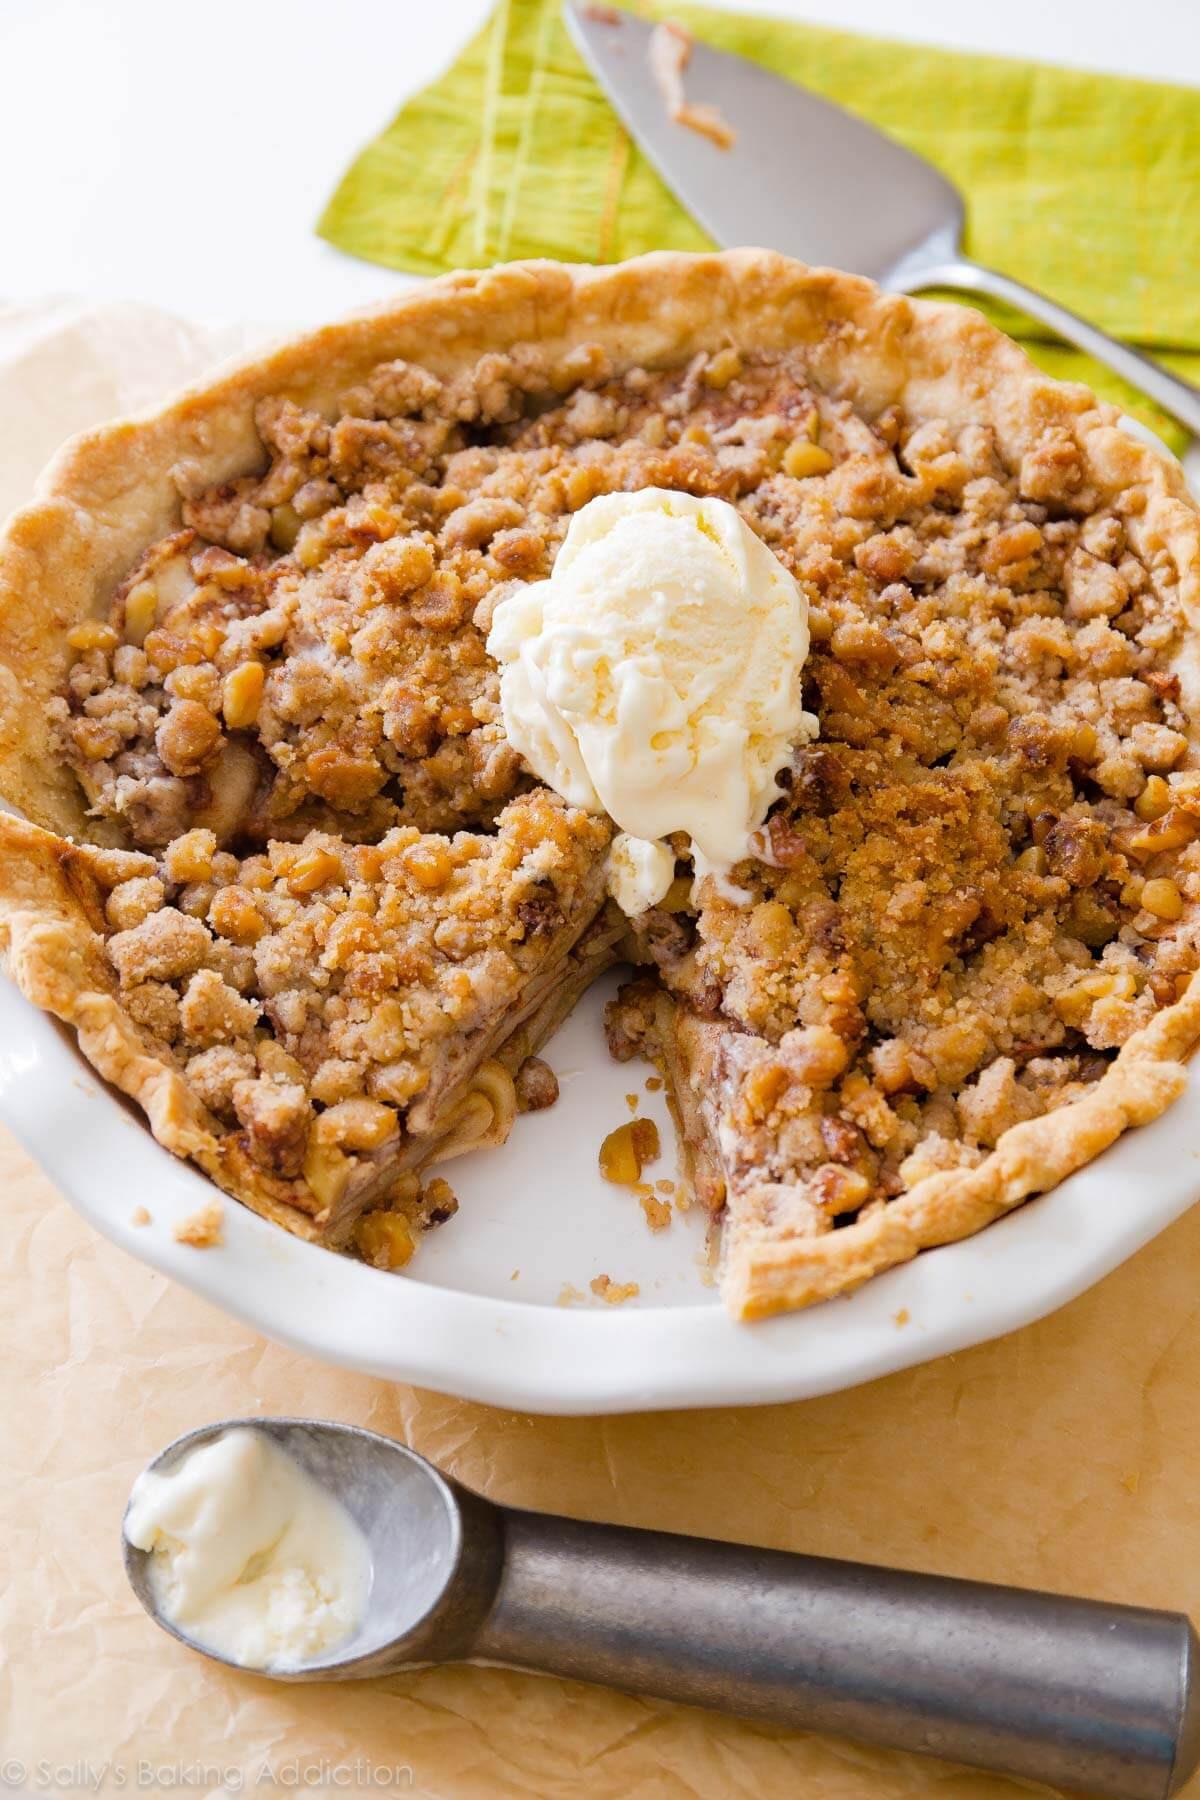 Apple Pie Topping  Apple Crumble Pie Sallys Baking Addiction